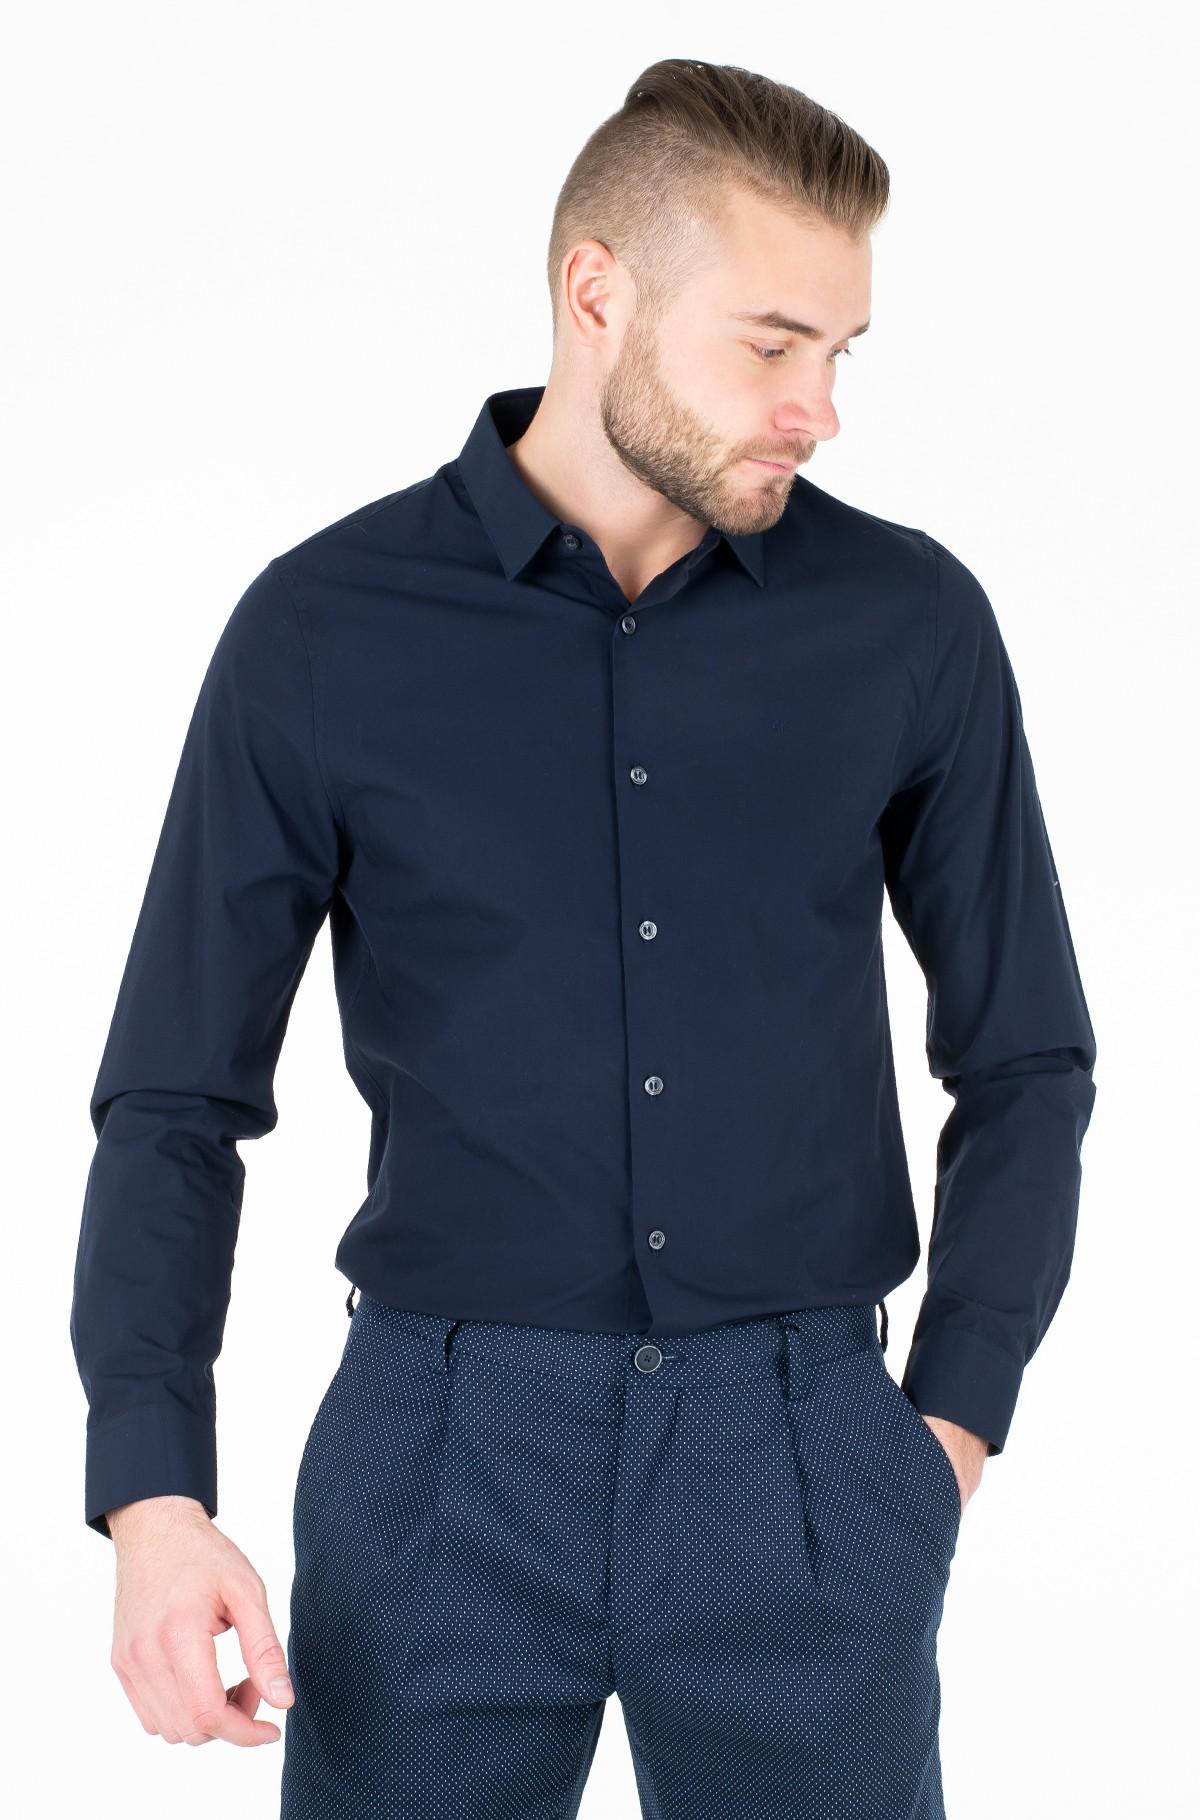 Marškiniai CK SLIM STRETCH SHIRT-full-1